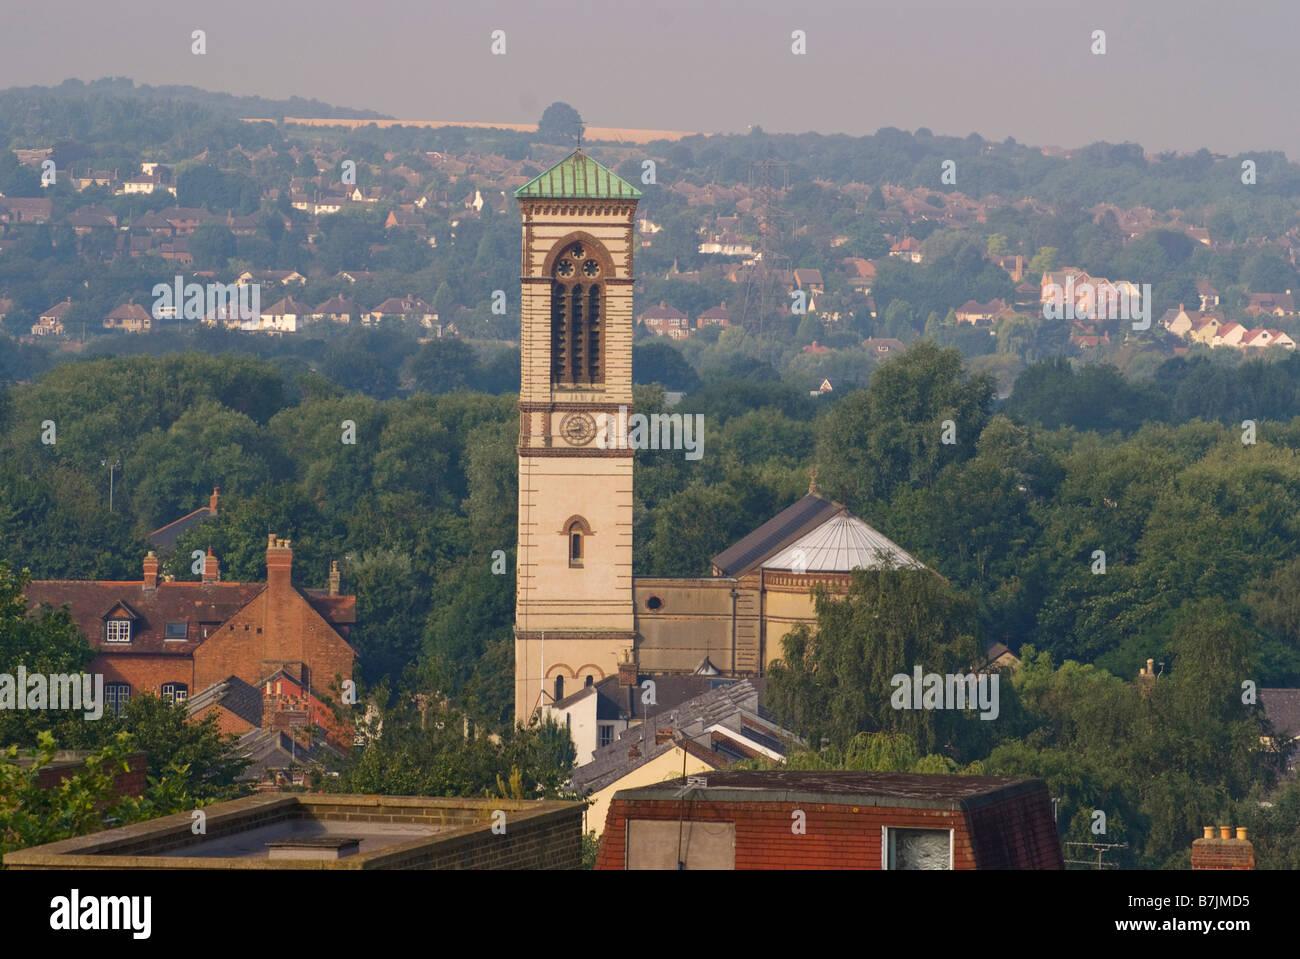 St Barnabas Church, Jericho, Oxford - Stock Image